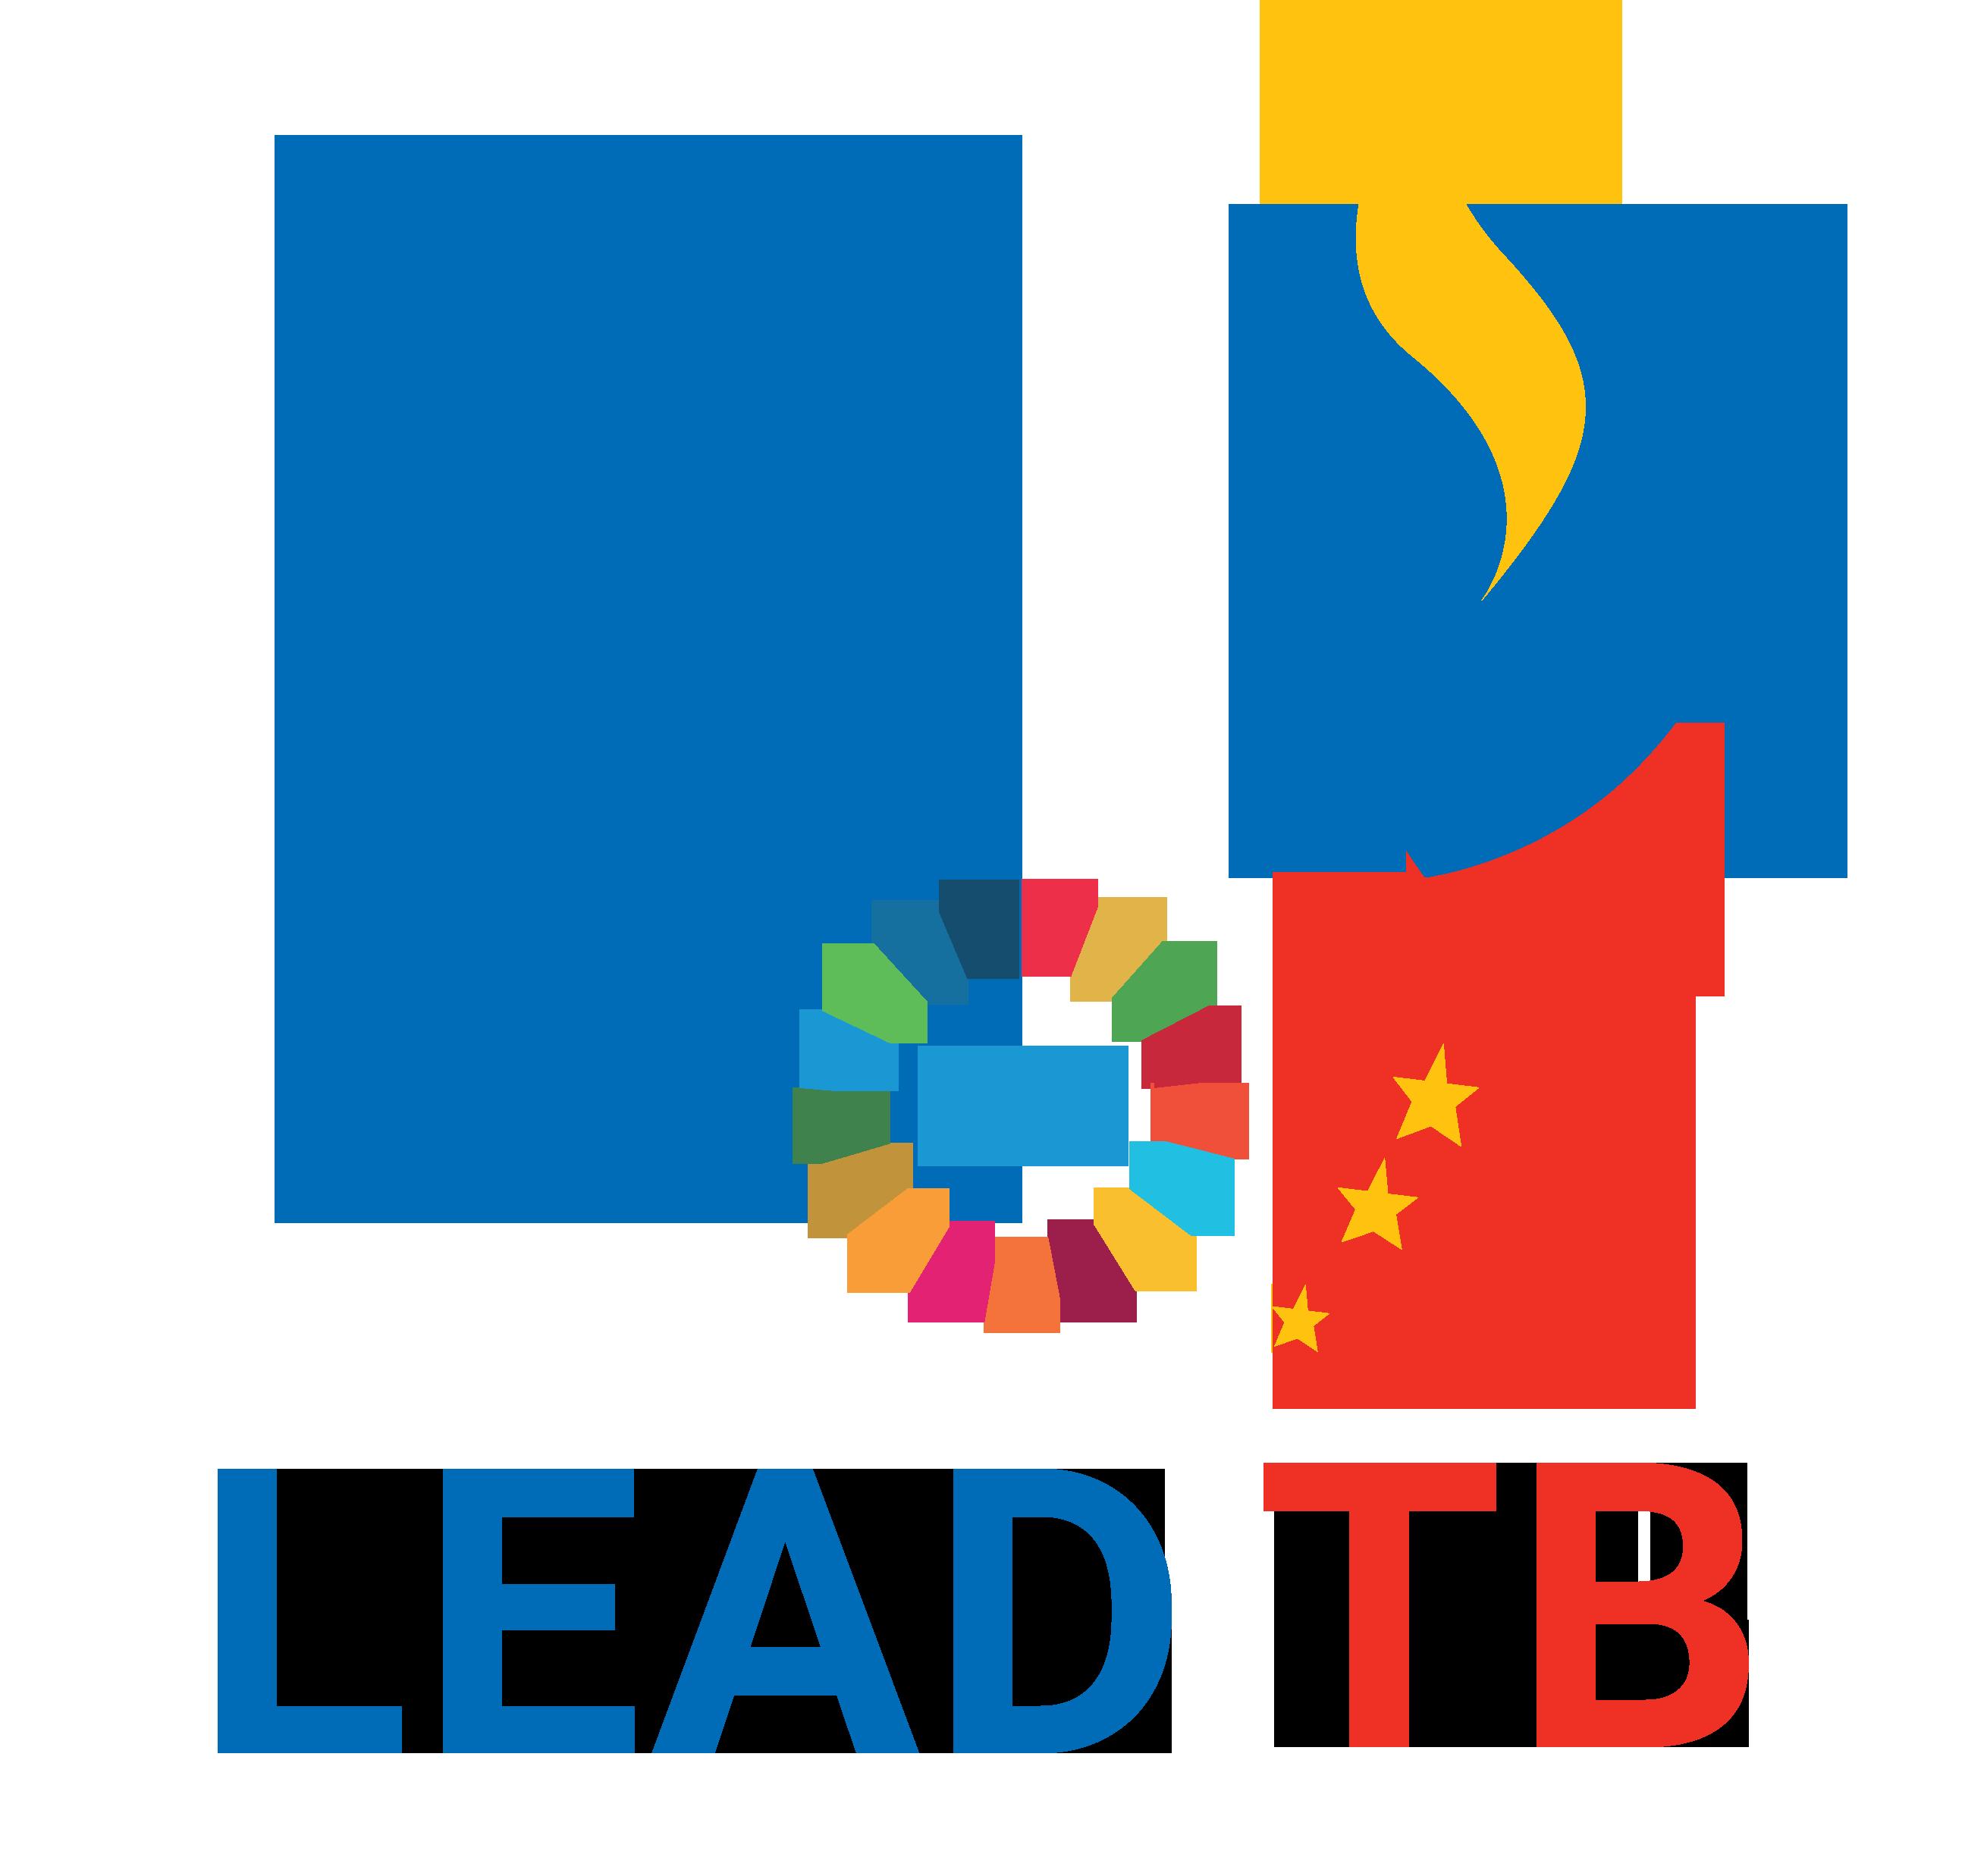 Lead TB